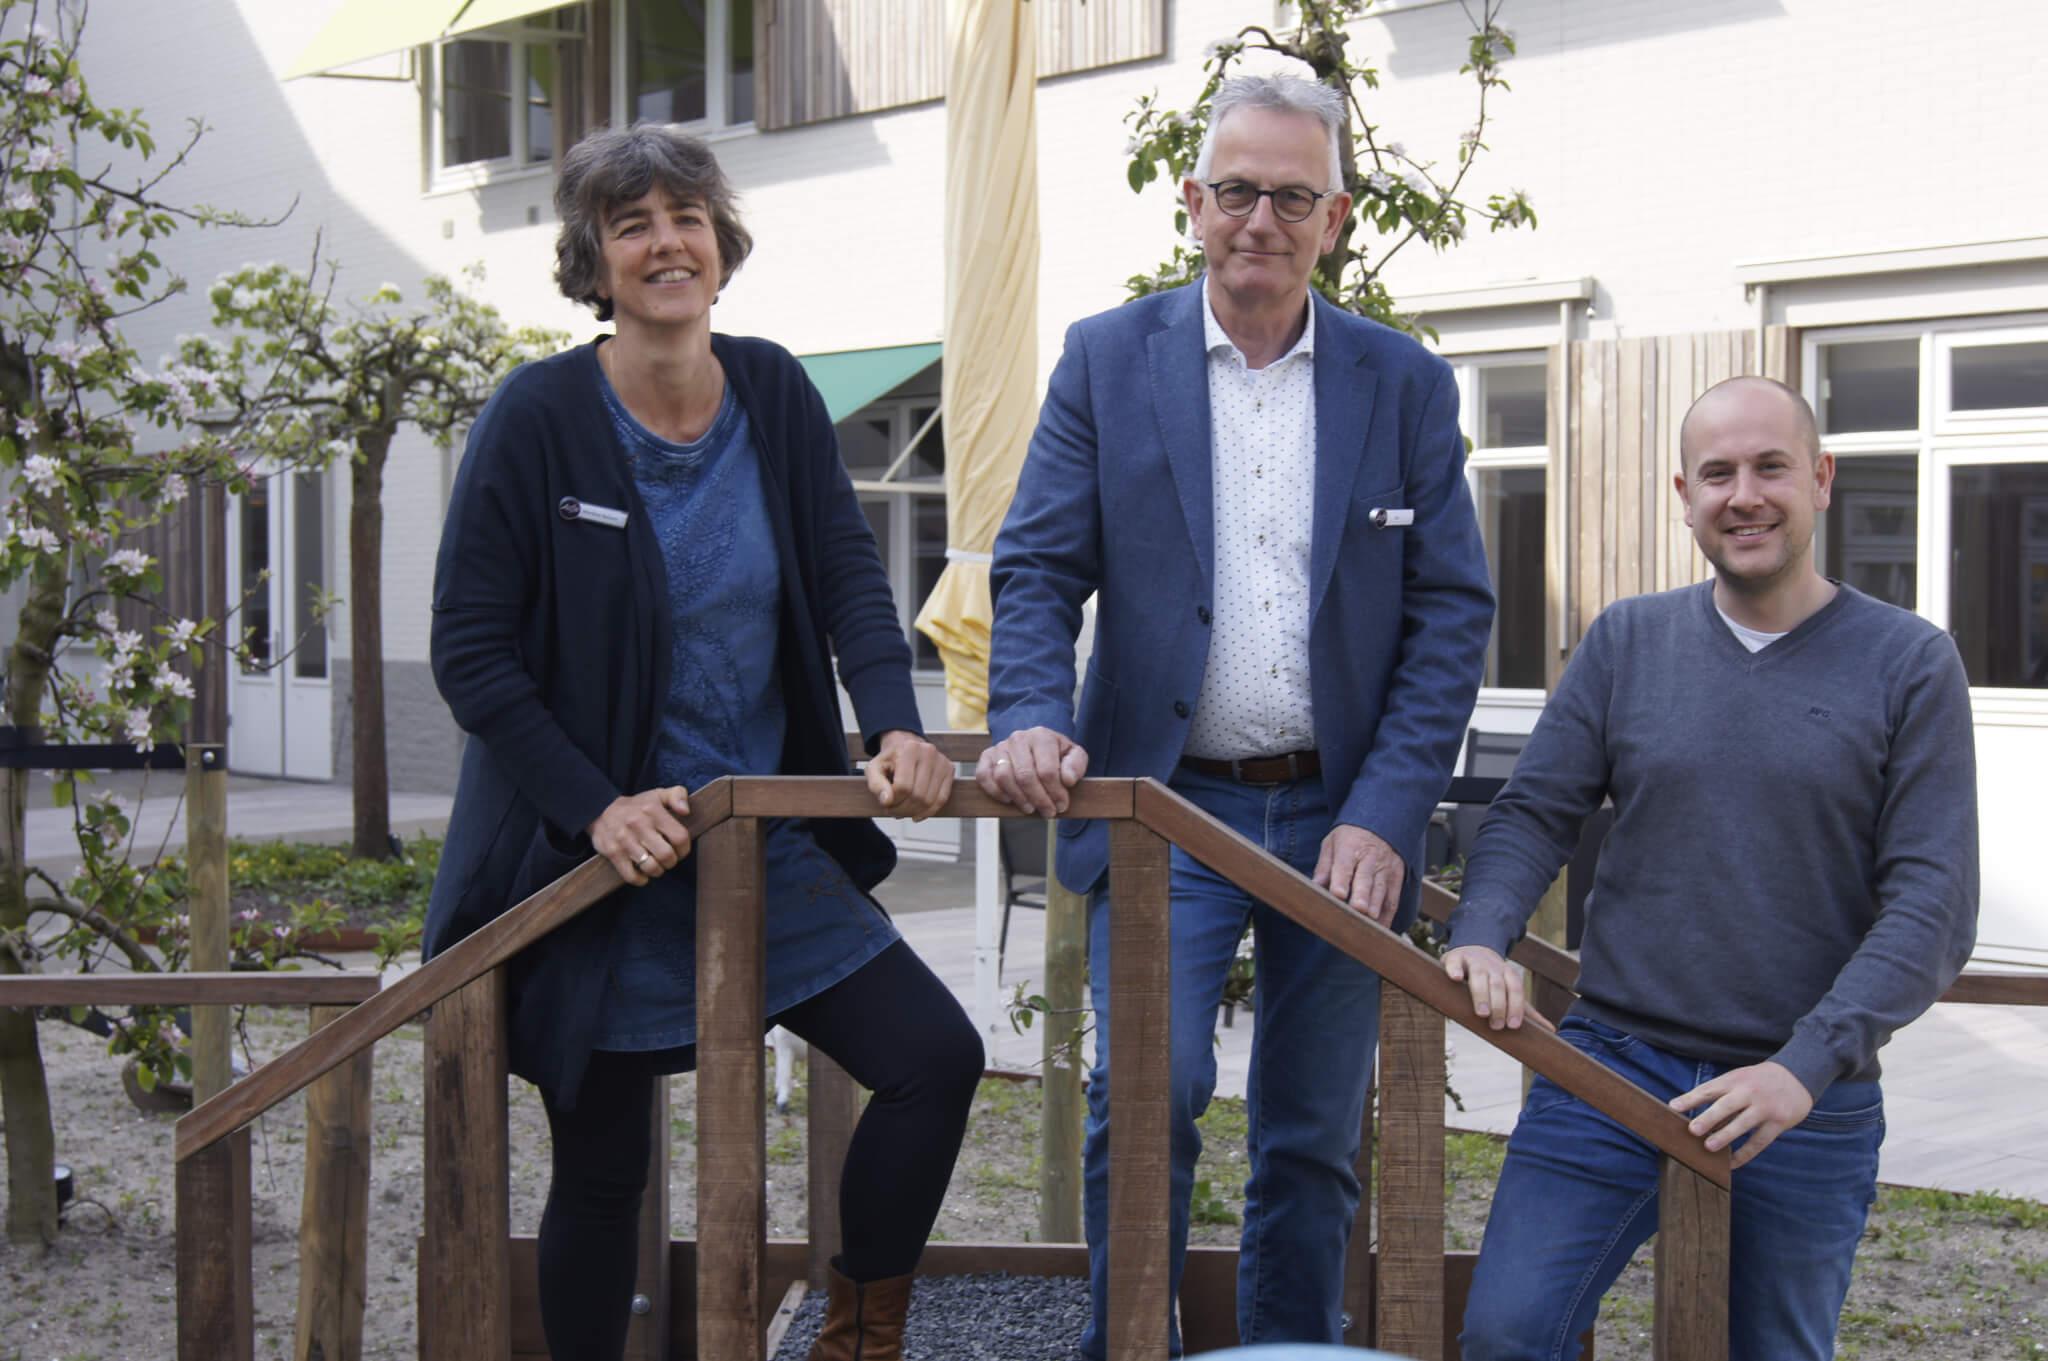 Vijf Havens - vlnr. Marlène Balvert, Jan Idema en Maurits Ozephius.